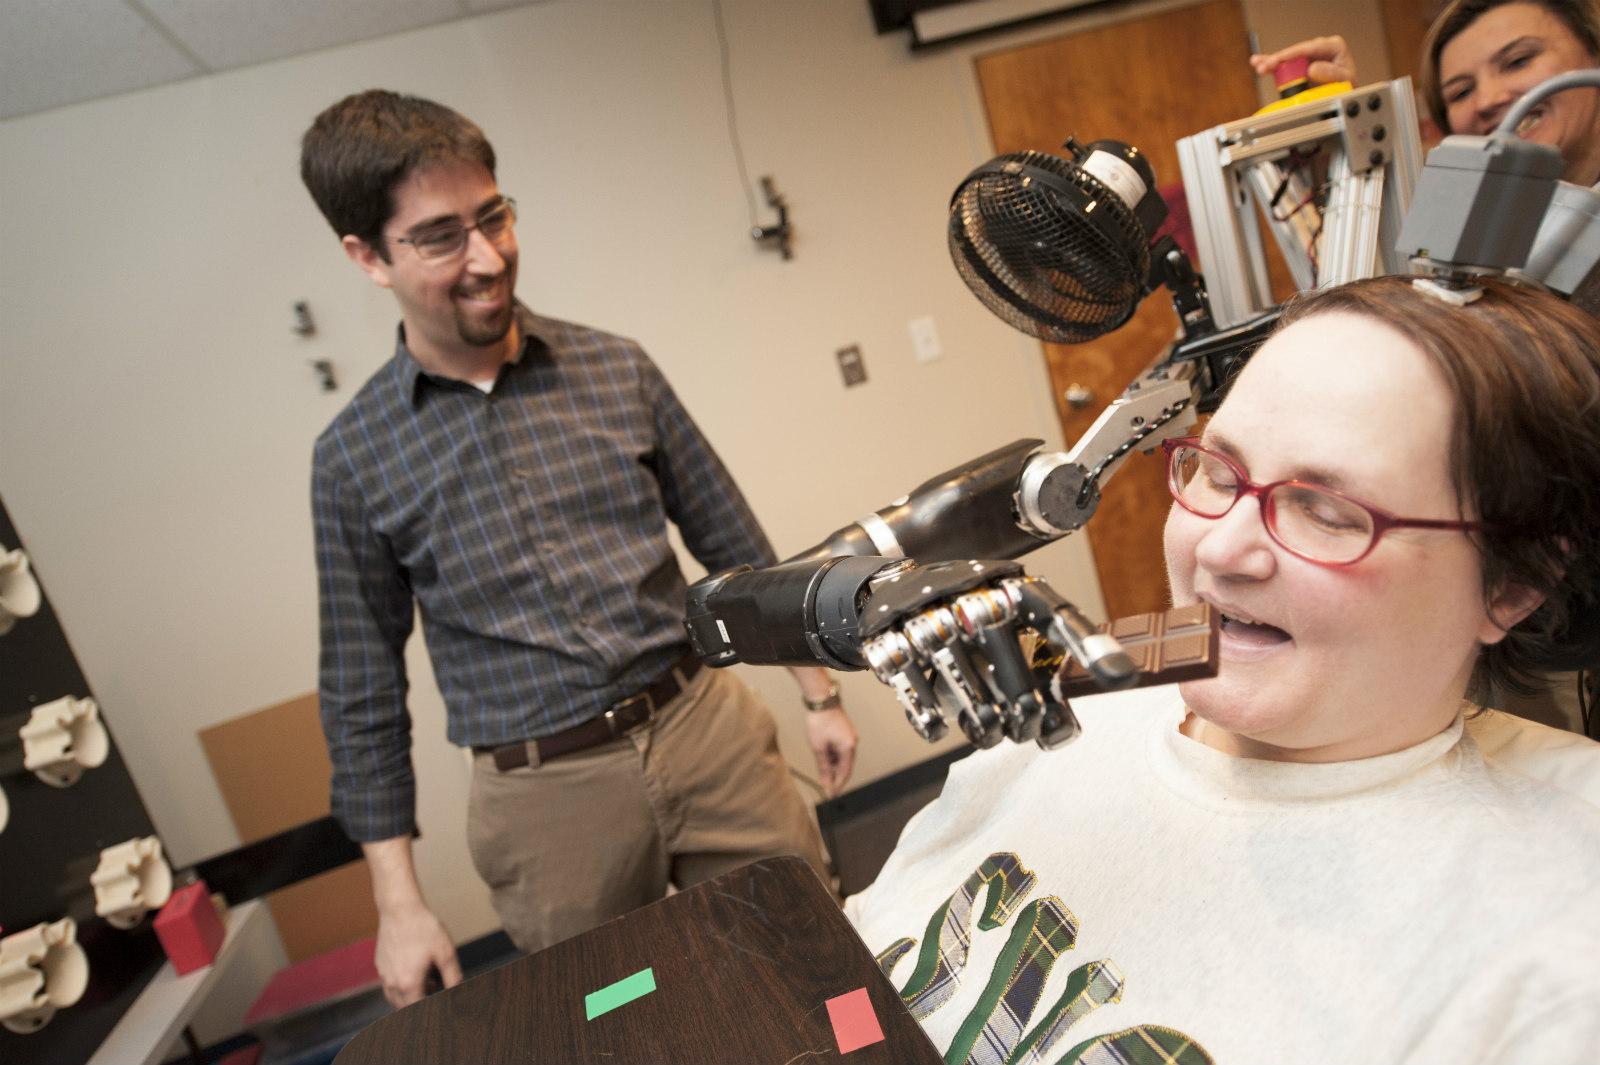 A Quadriplegic woman controlling a robotic arm in three dimensions through a BCI, UPMC, 2012.